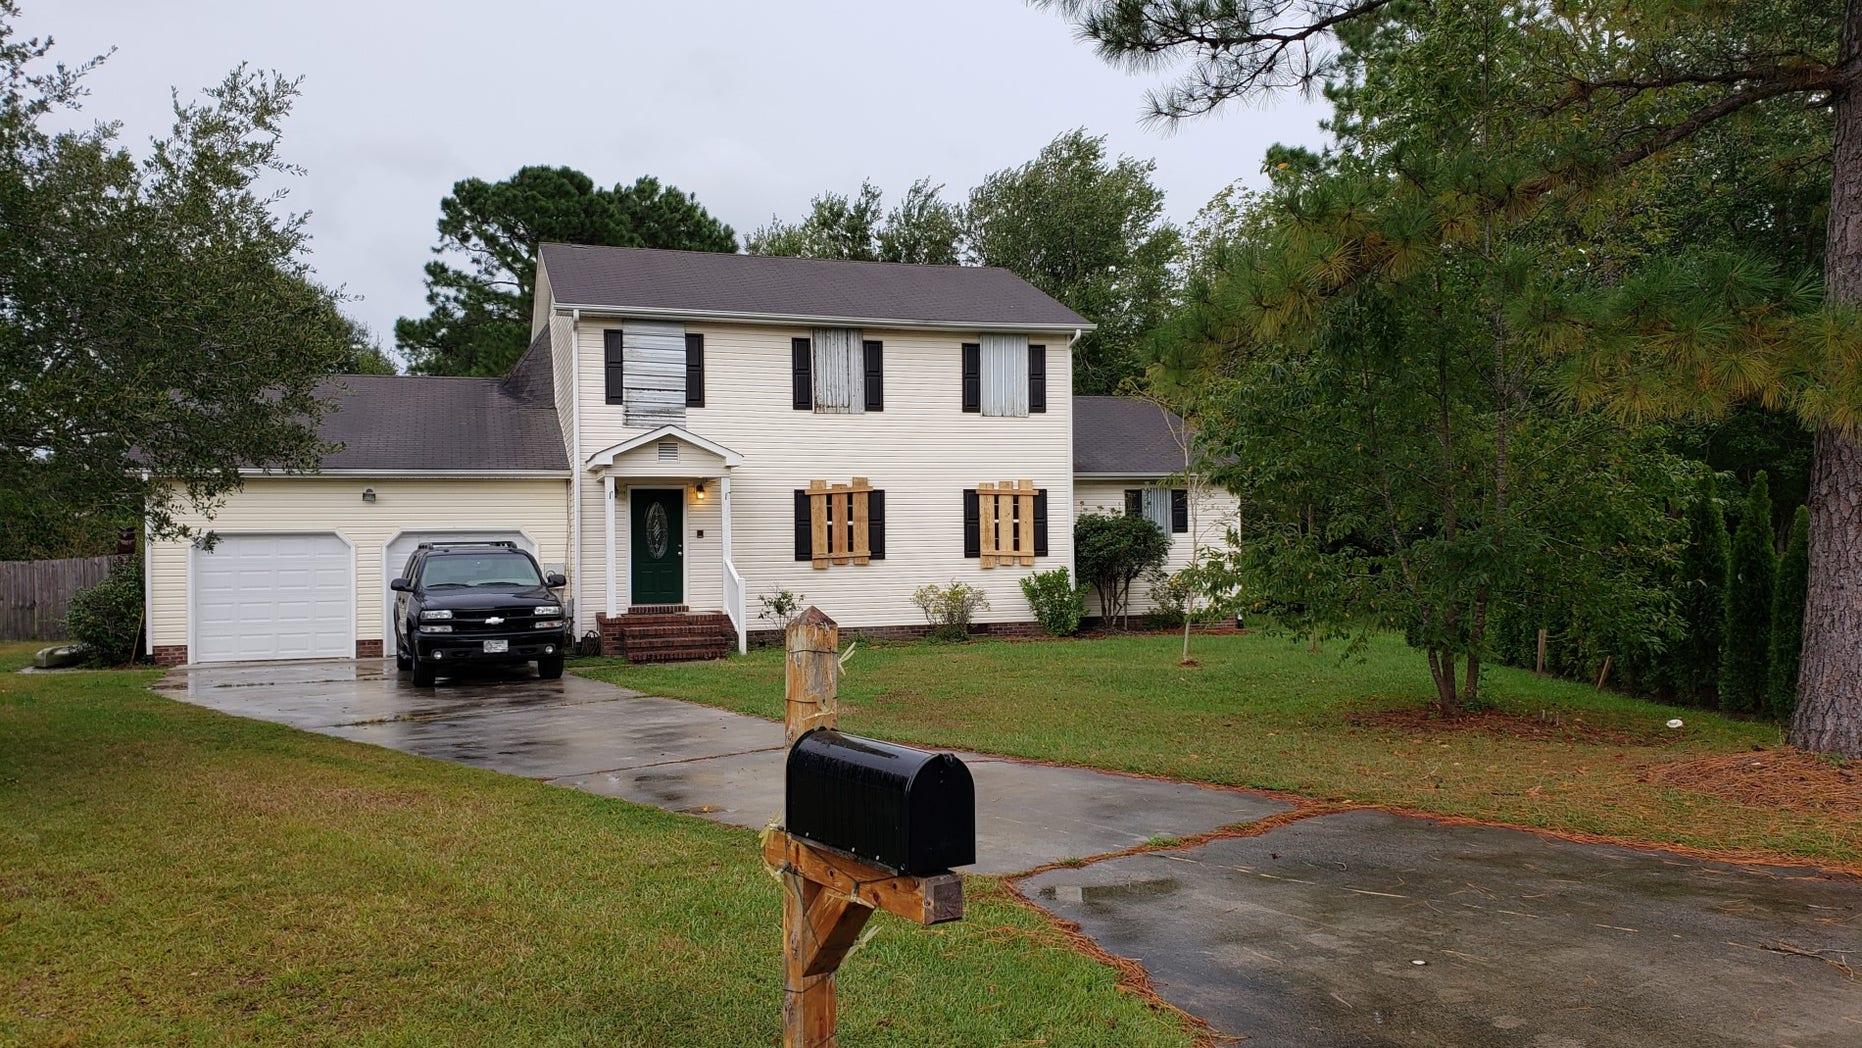 Jeremy's home in Wilmington, North Carolina.